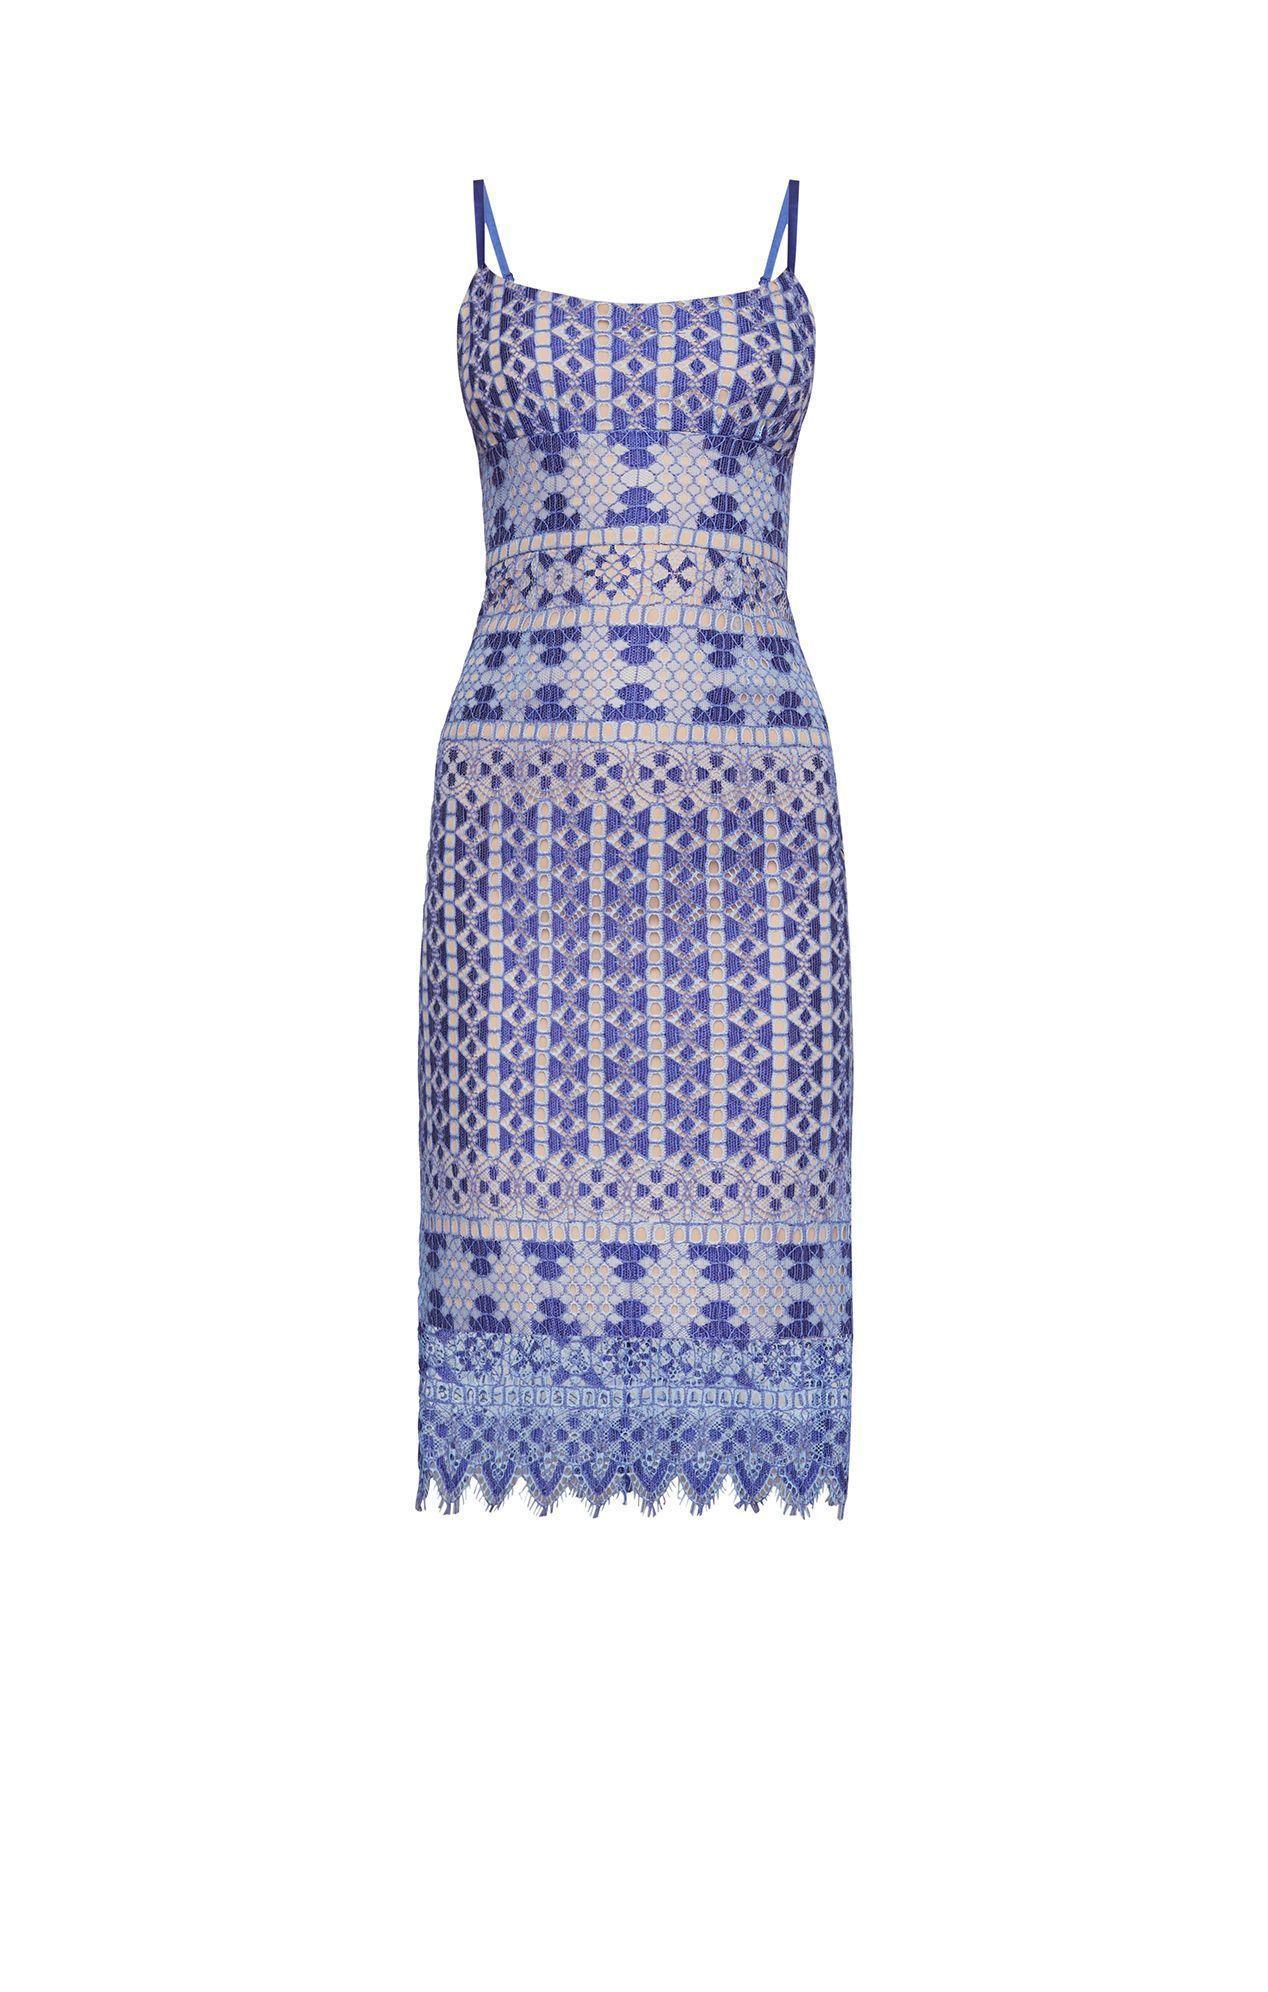 6c494263119 BCBGMAXAZRIA. Women s Alese Light Blue Asymmetrical Geometric Lace Dress  Xde61i99-e71.  295  251 From Runway Catalog